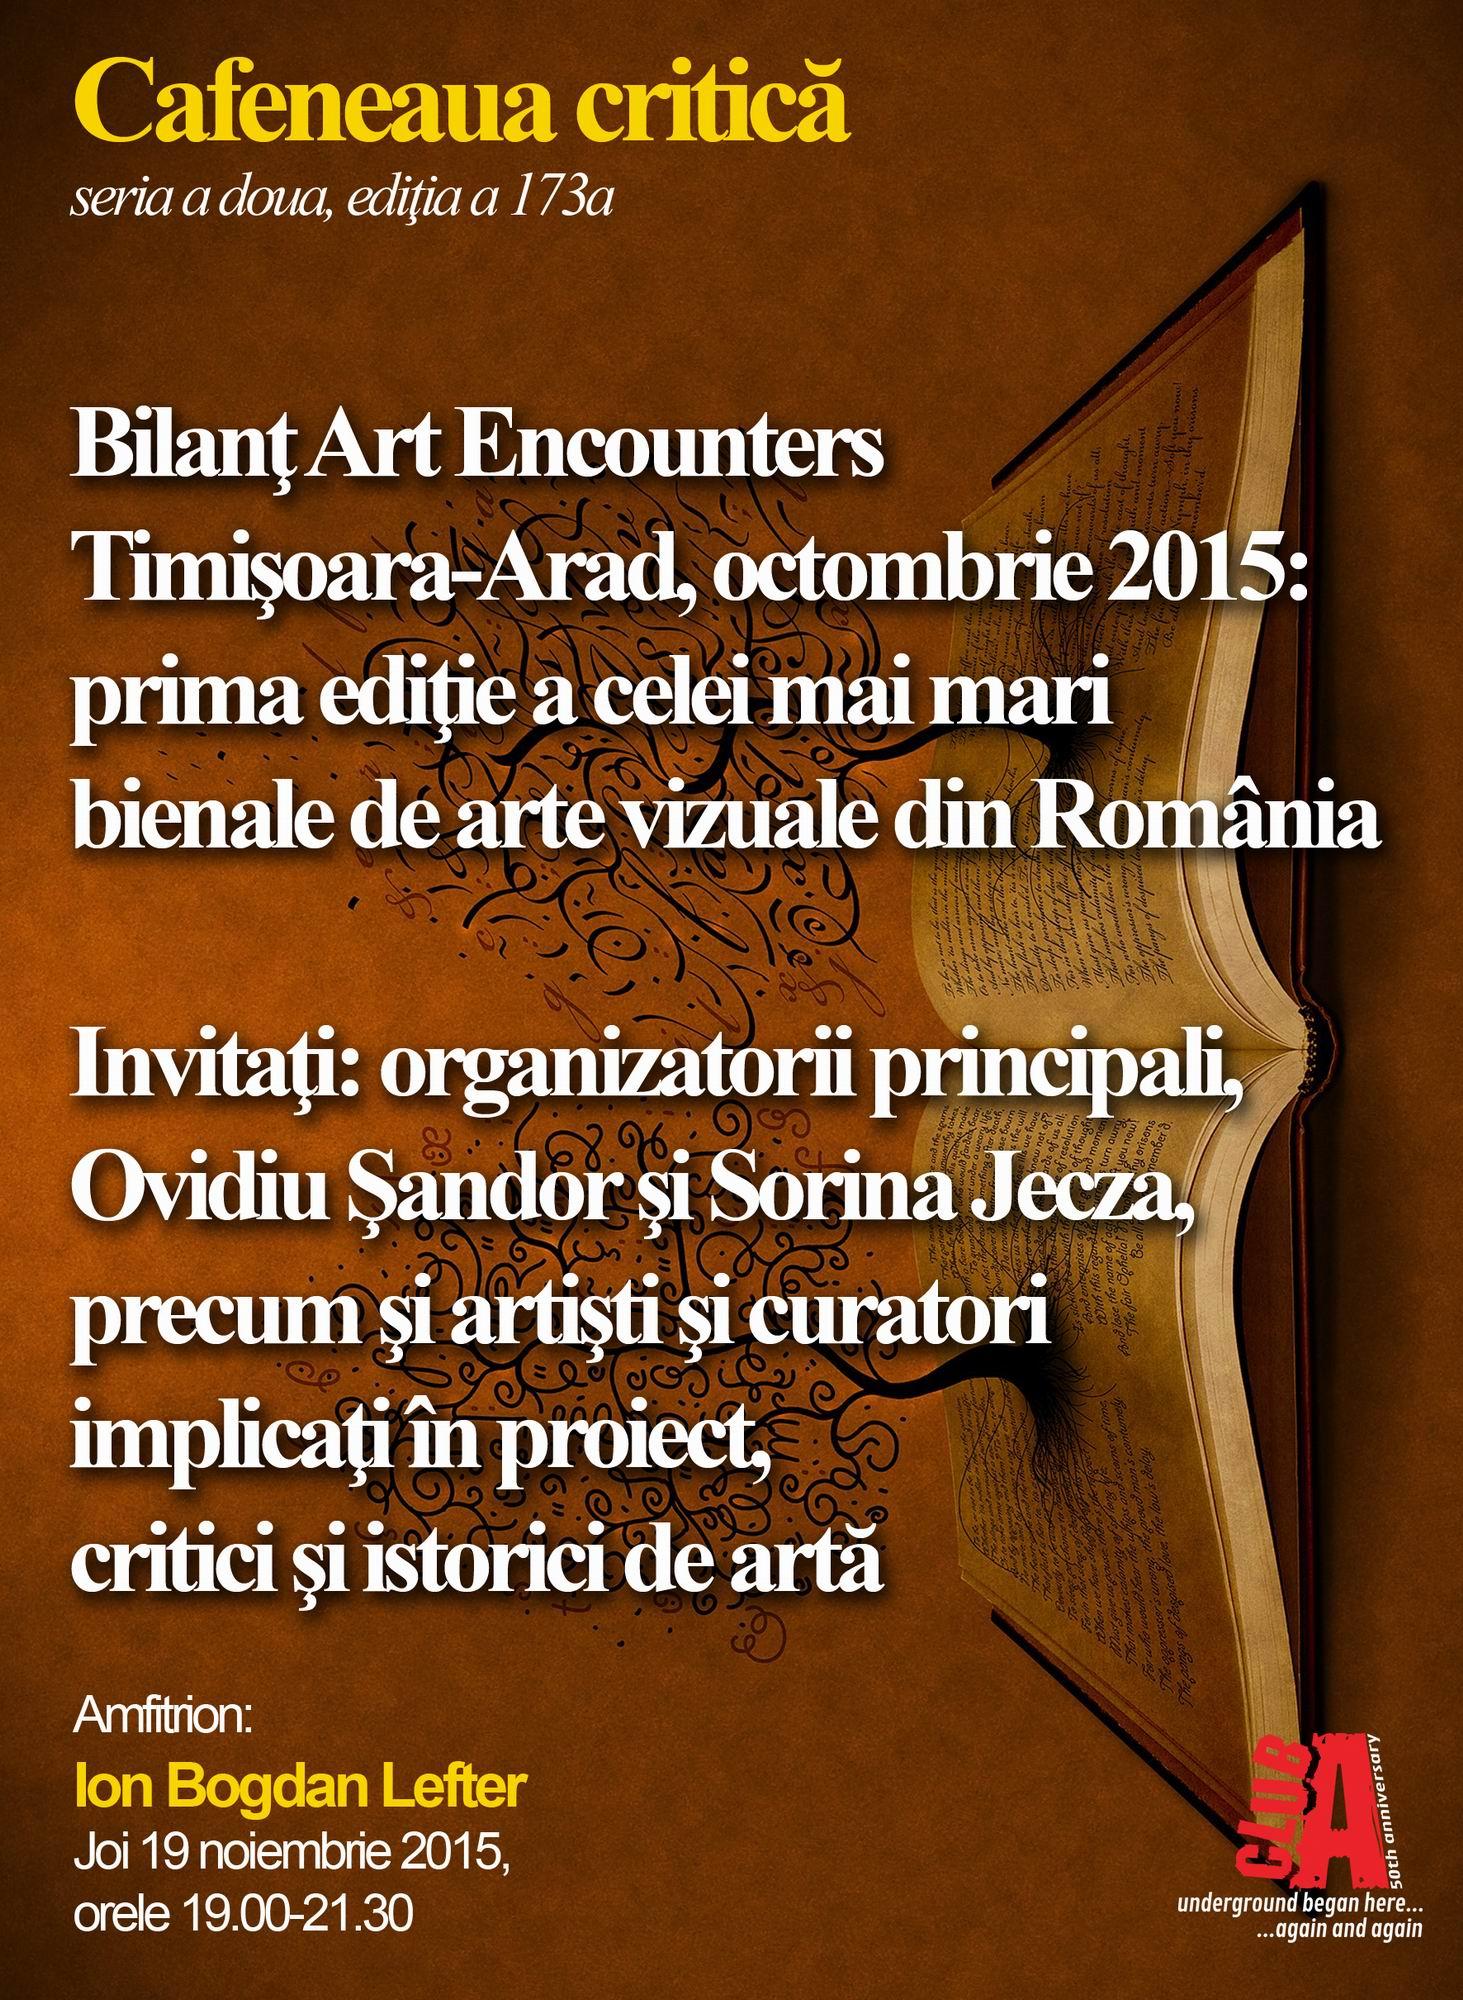 Bilanţ Art Encounters la Cafeneaua critică